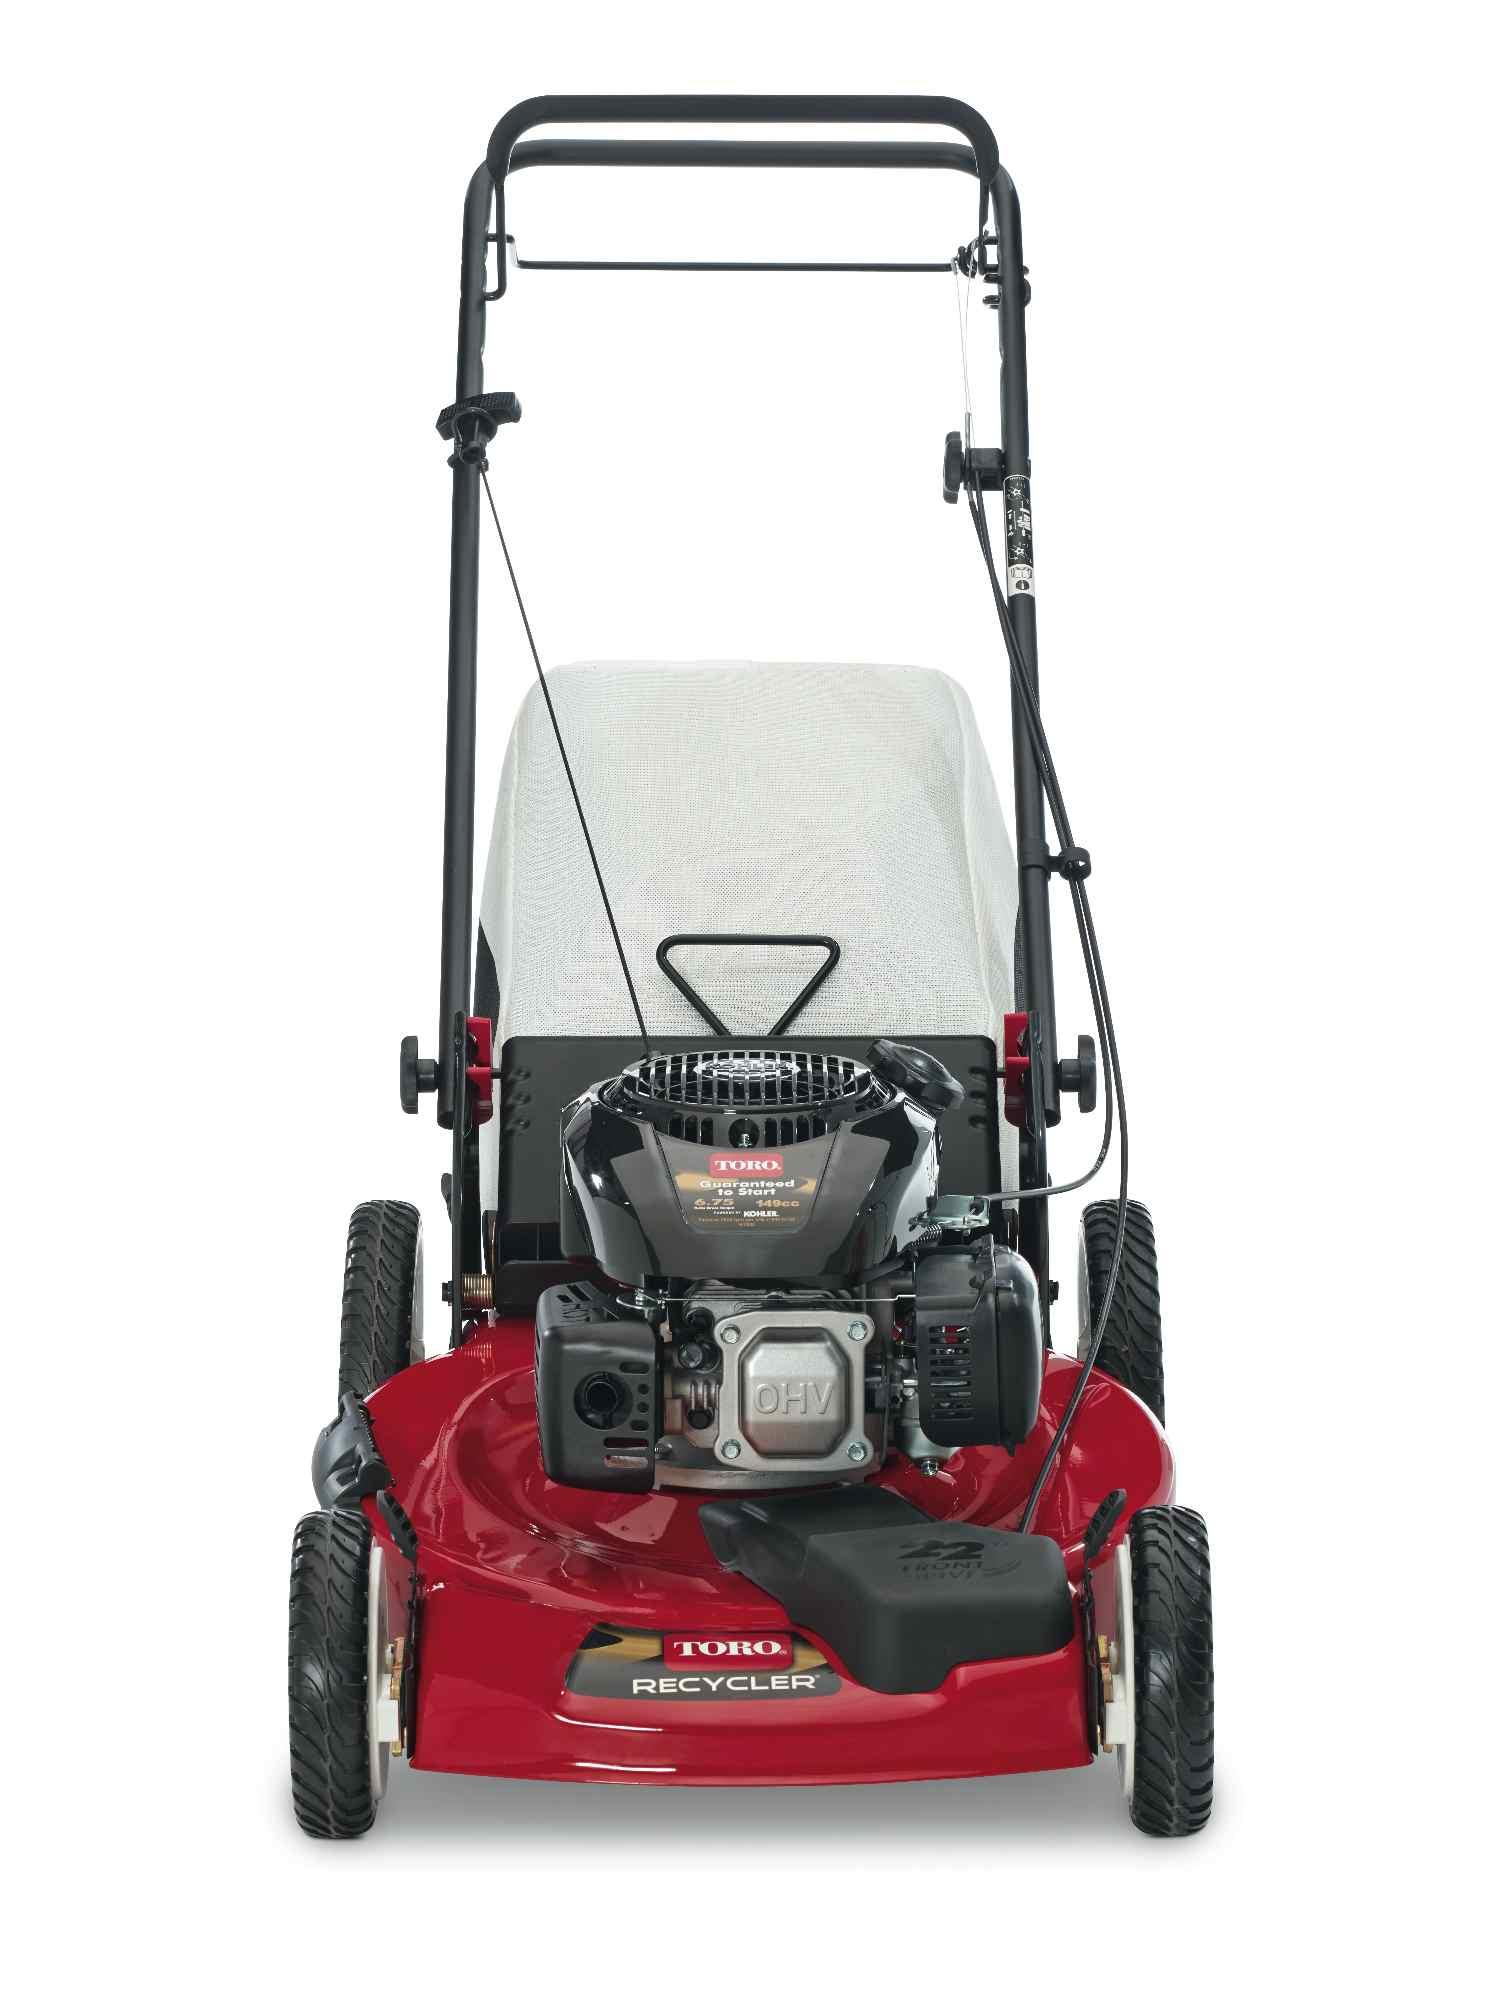 toro lawn mower troubleshooting guide